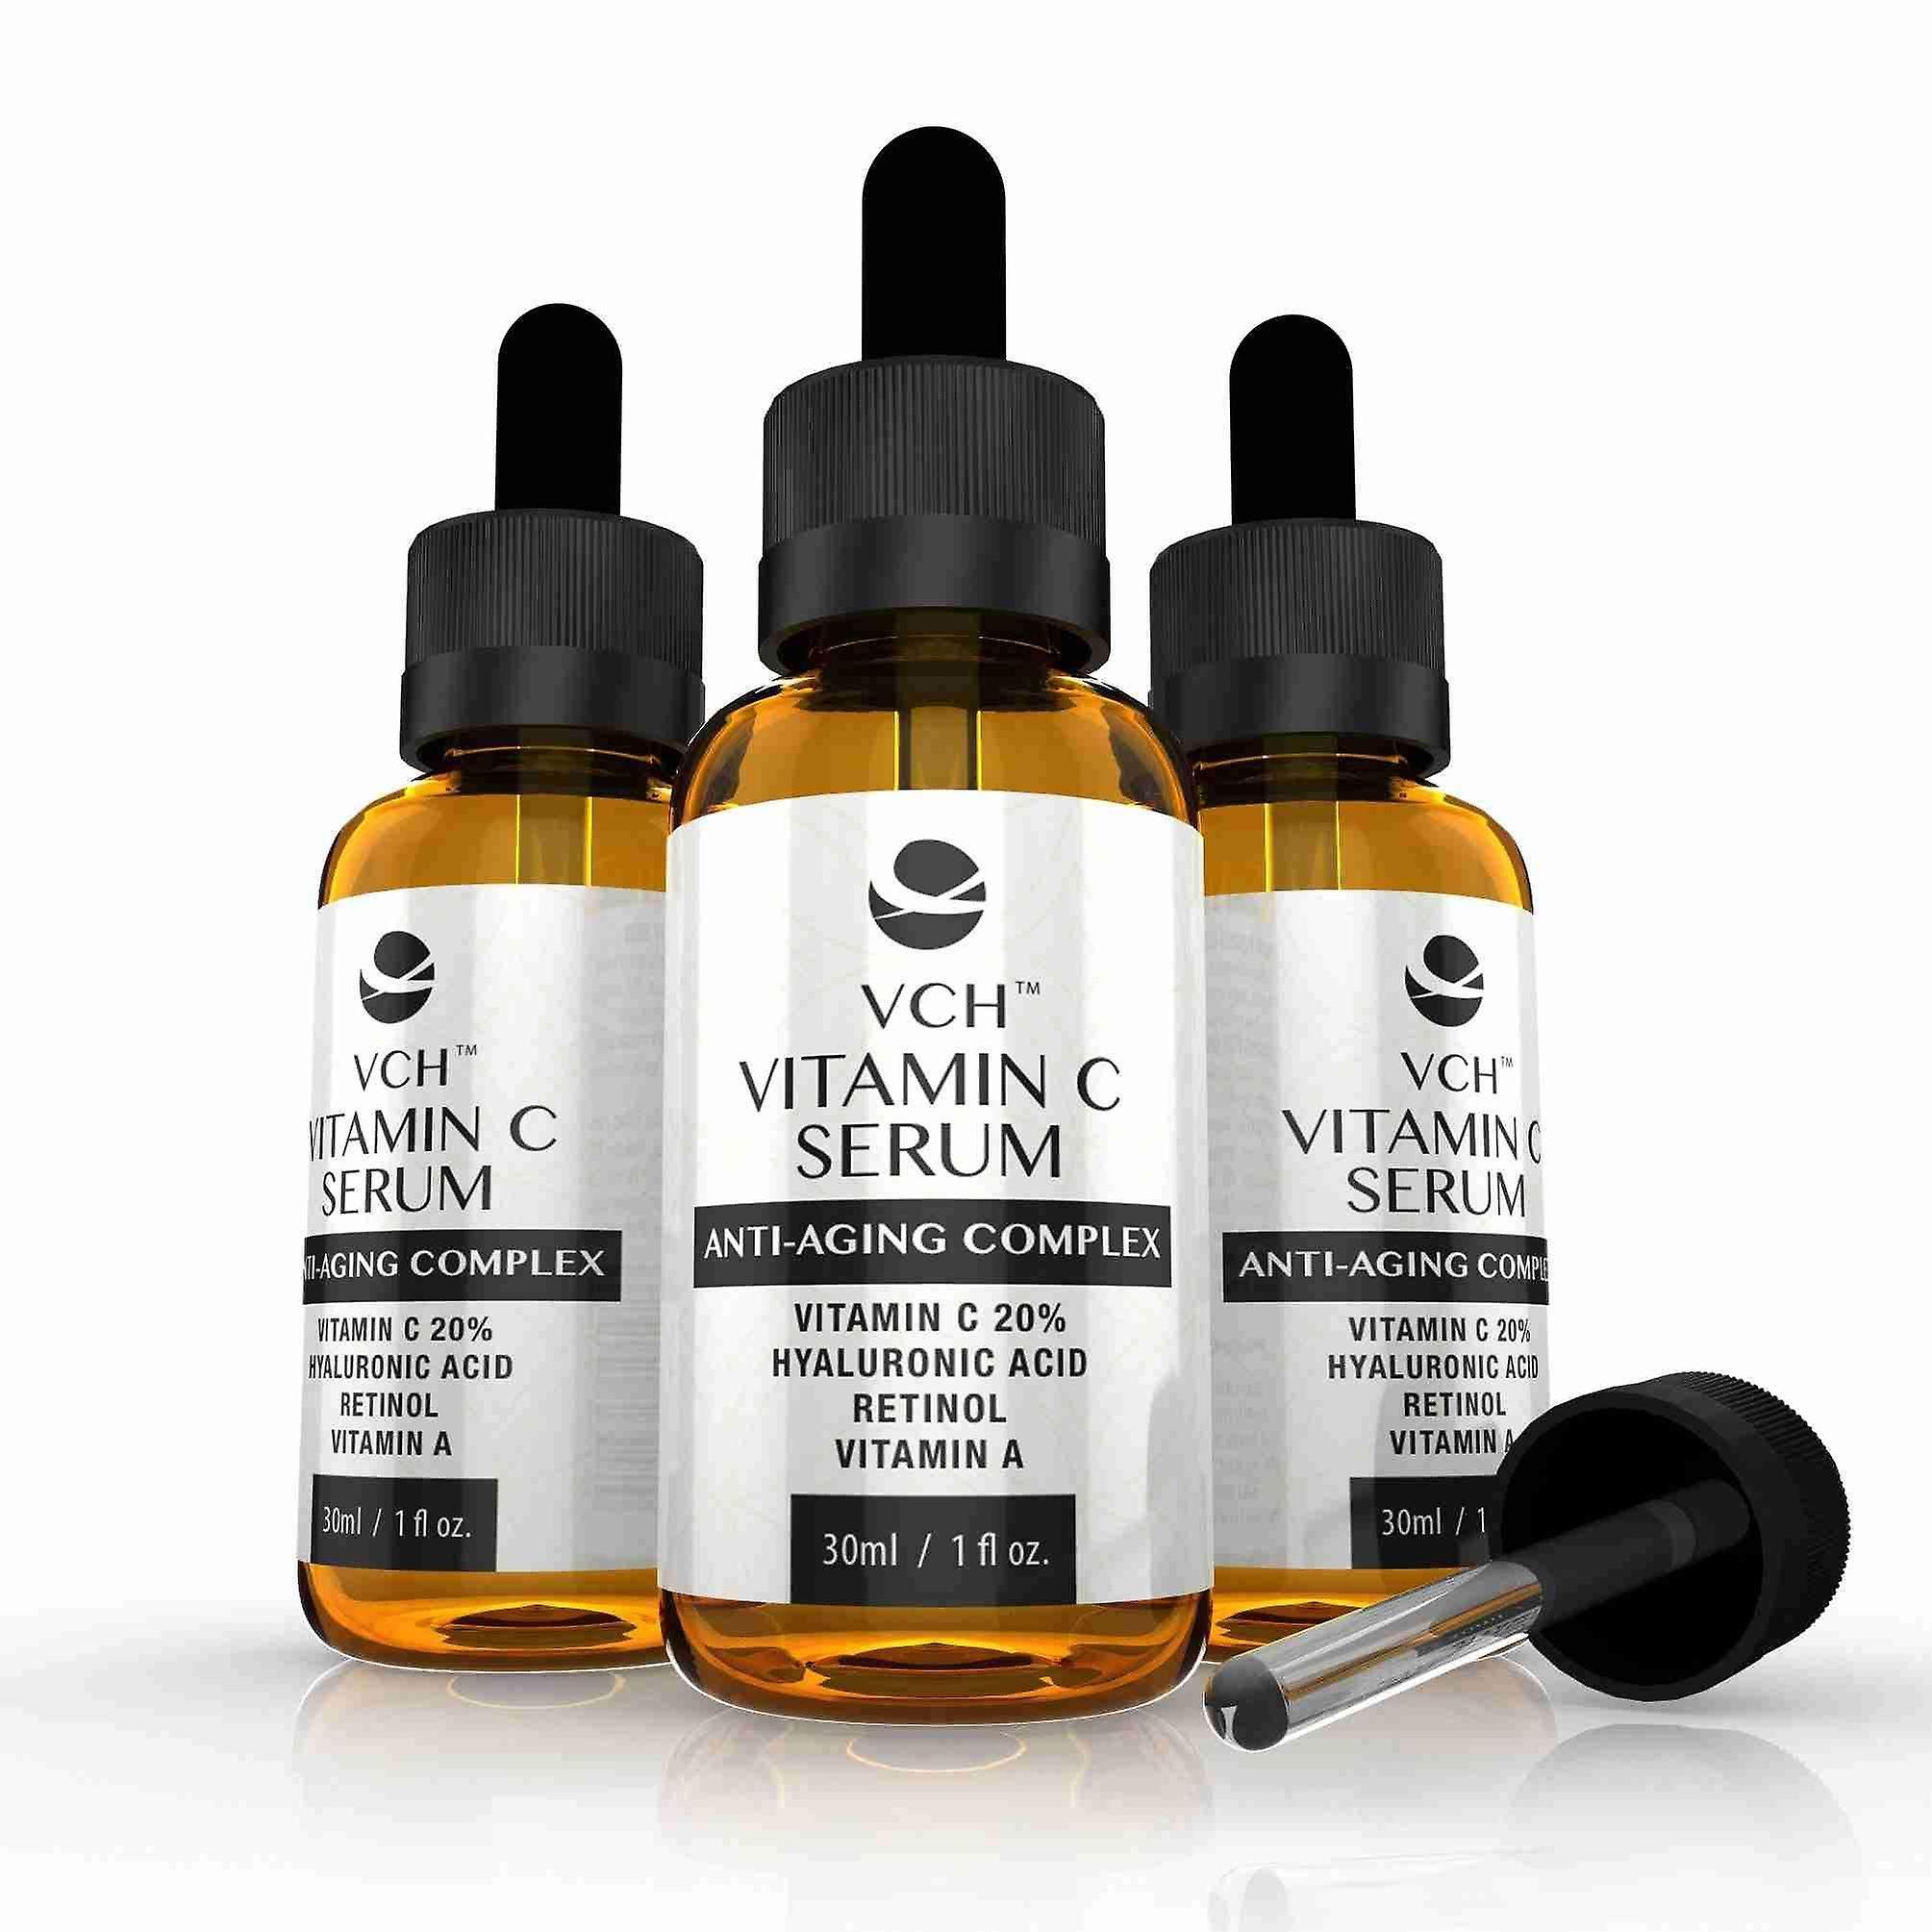 VCH 20% Vitamin C Serum with Hyaluronic Acid, Retinol and Vitamin A - 3 Bottles (90ml) - Vitamin C Anti-Aging Serum - Evolution Slimming